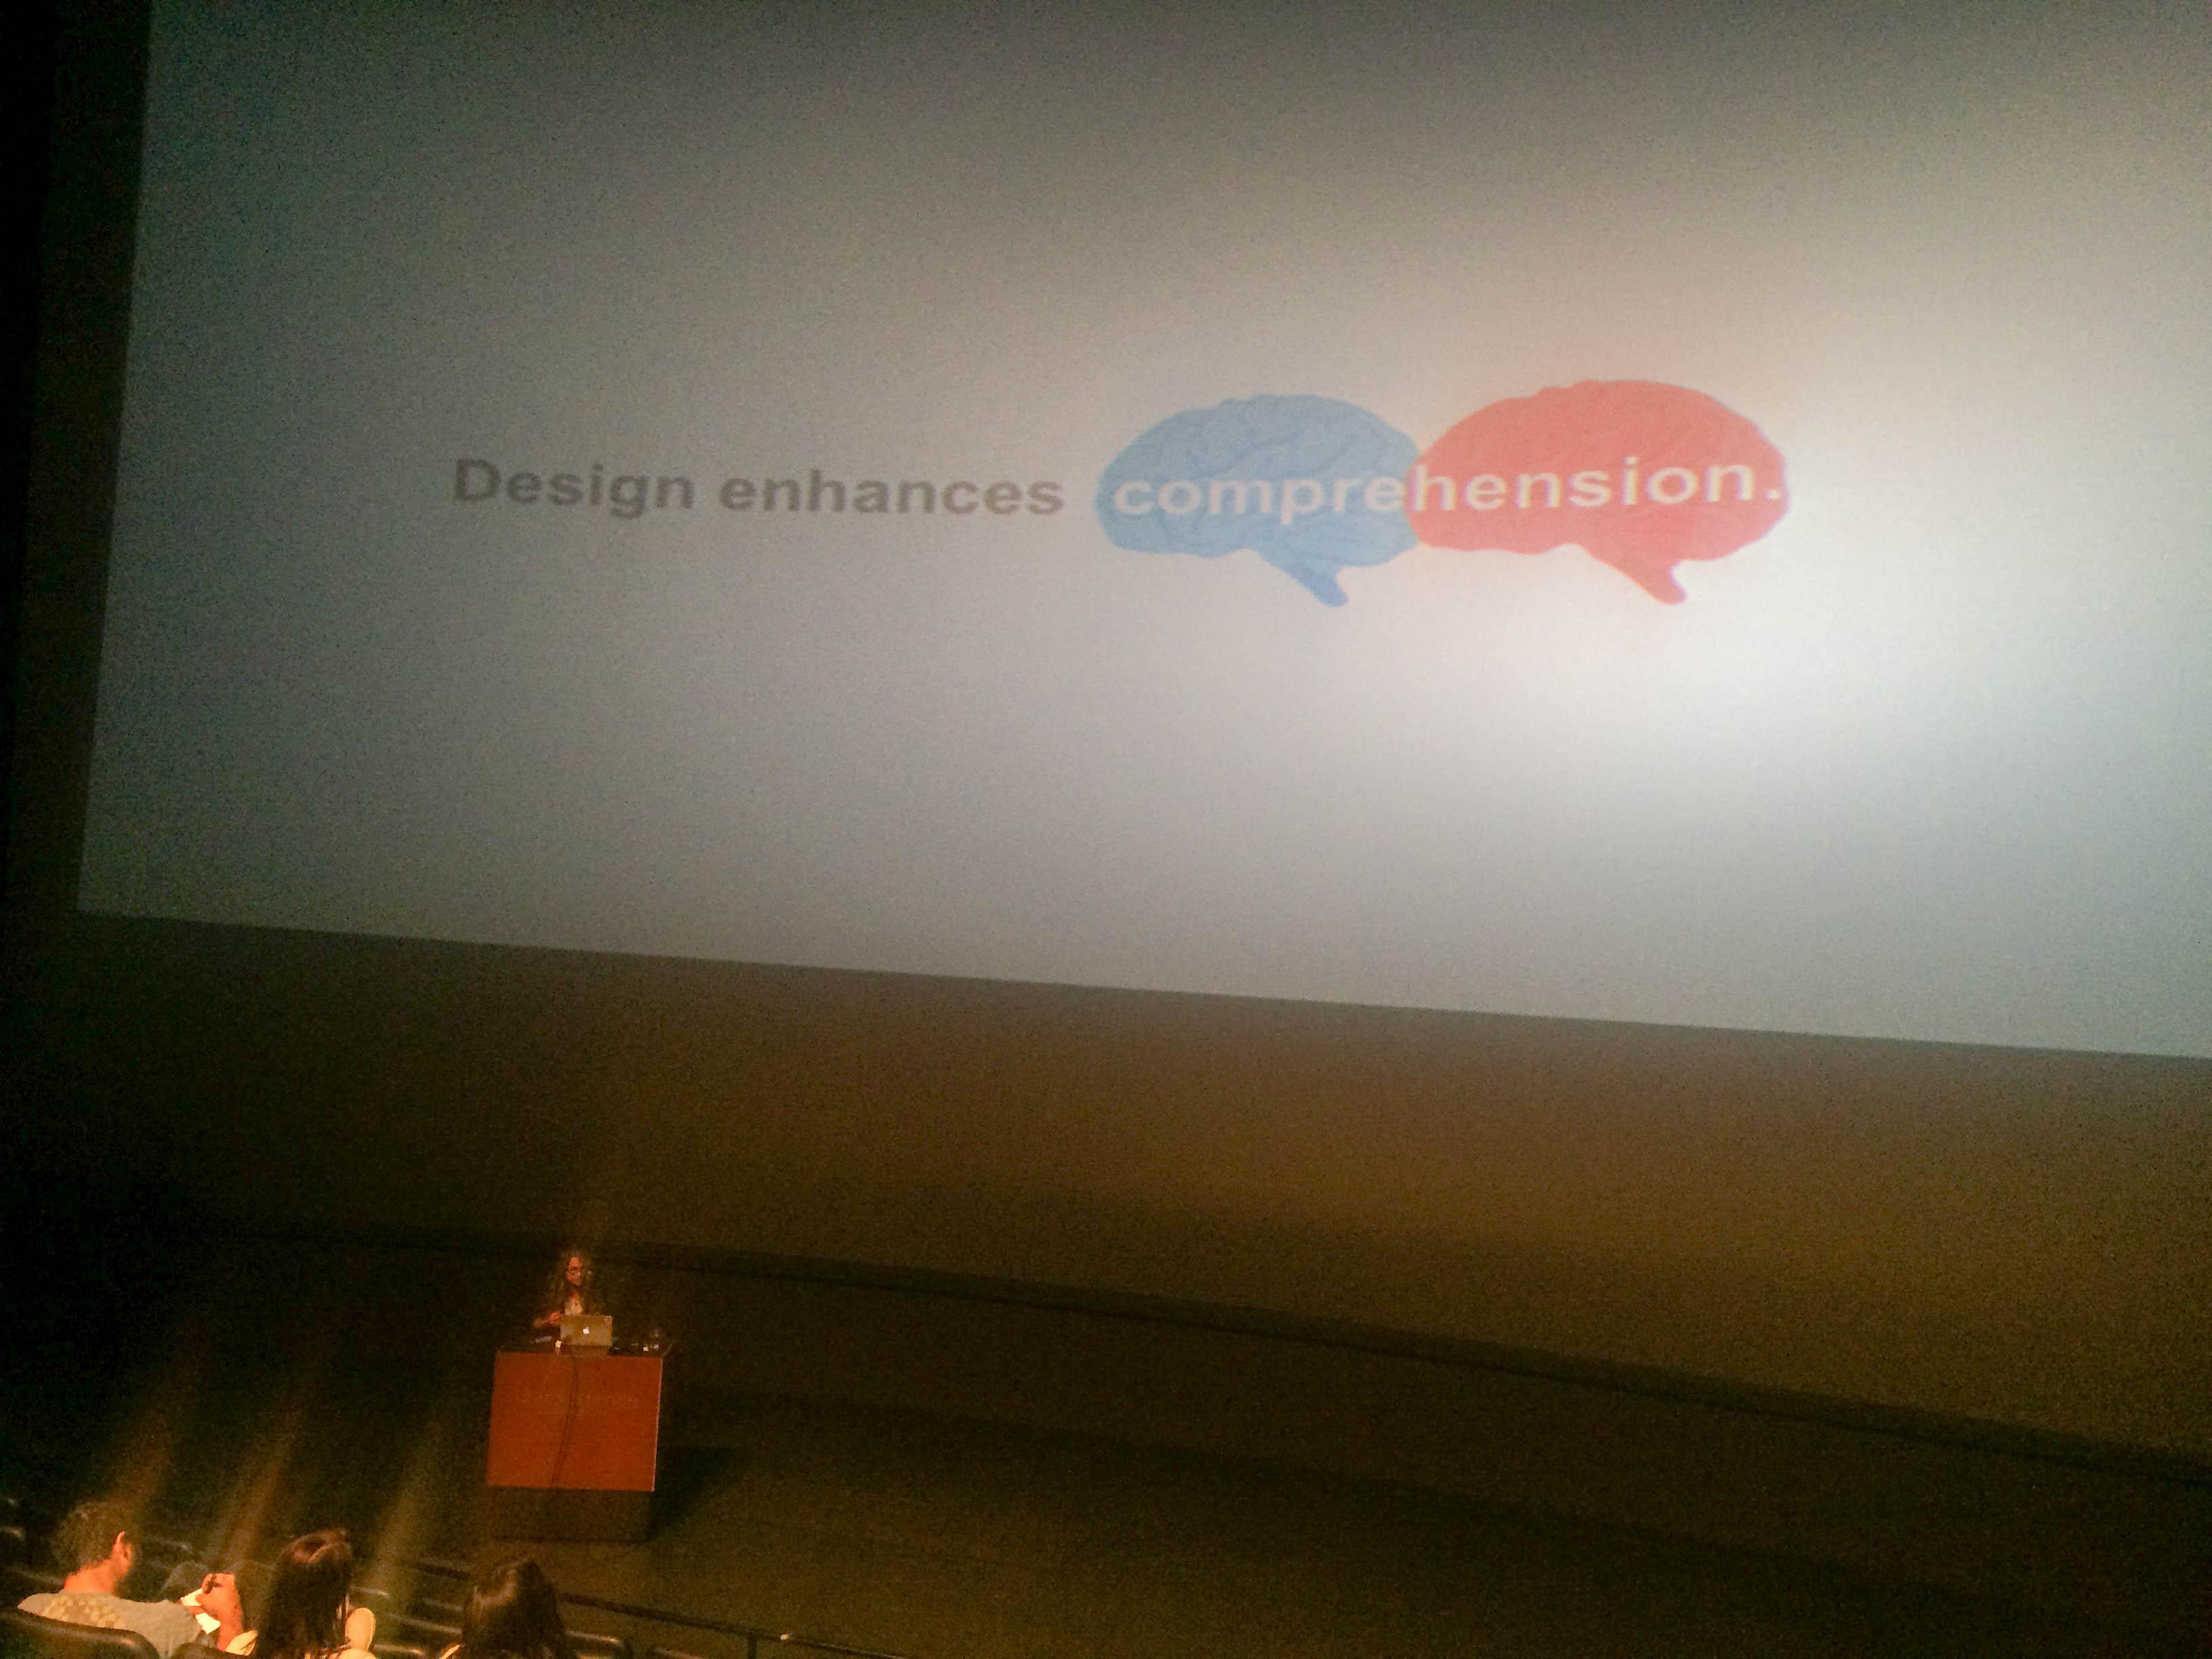 Design Enhances Comprehension